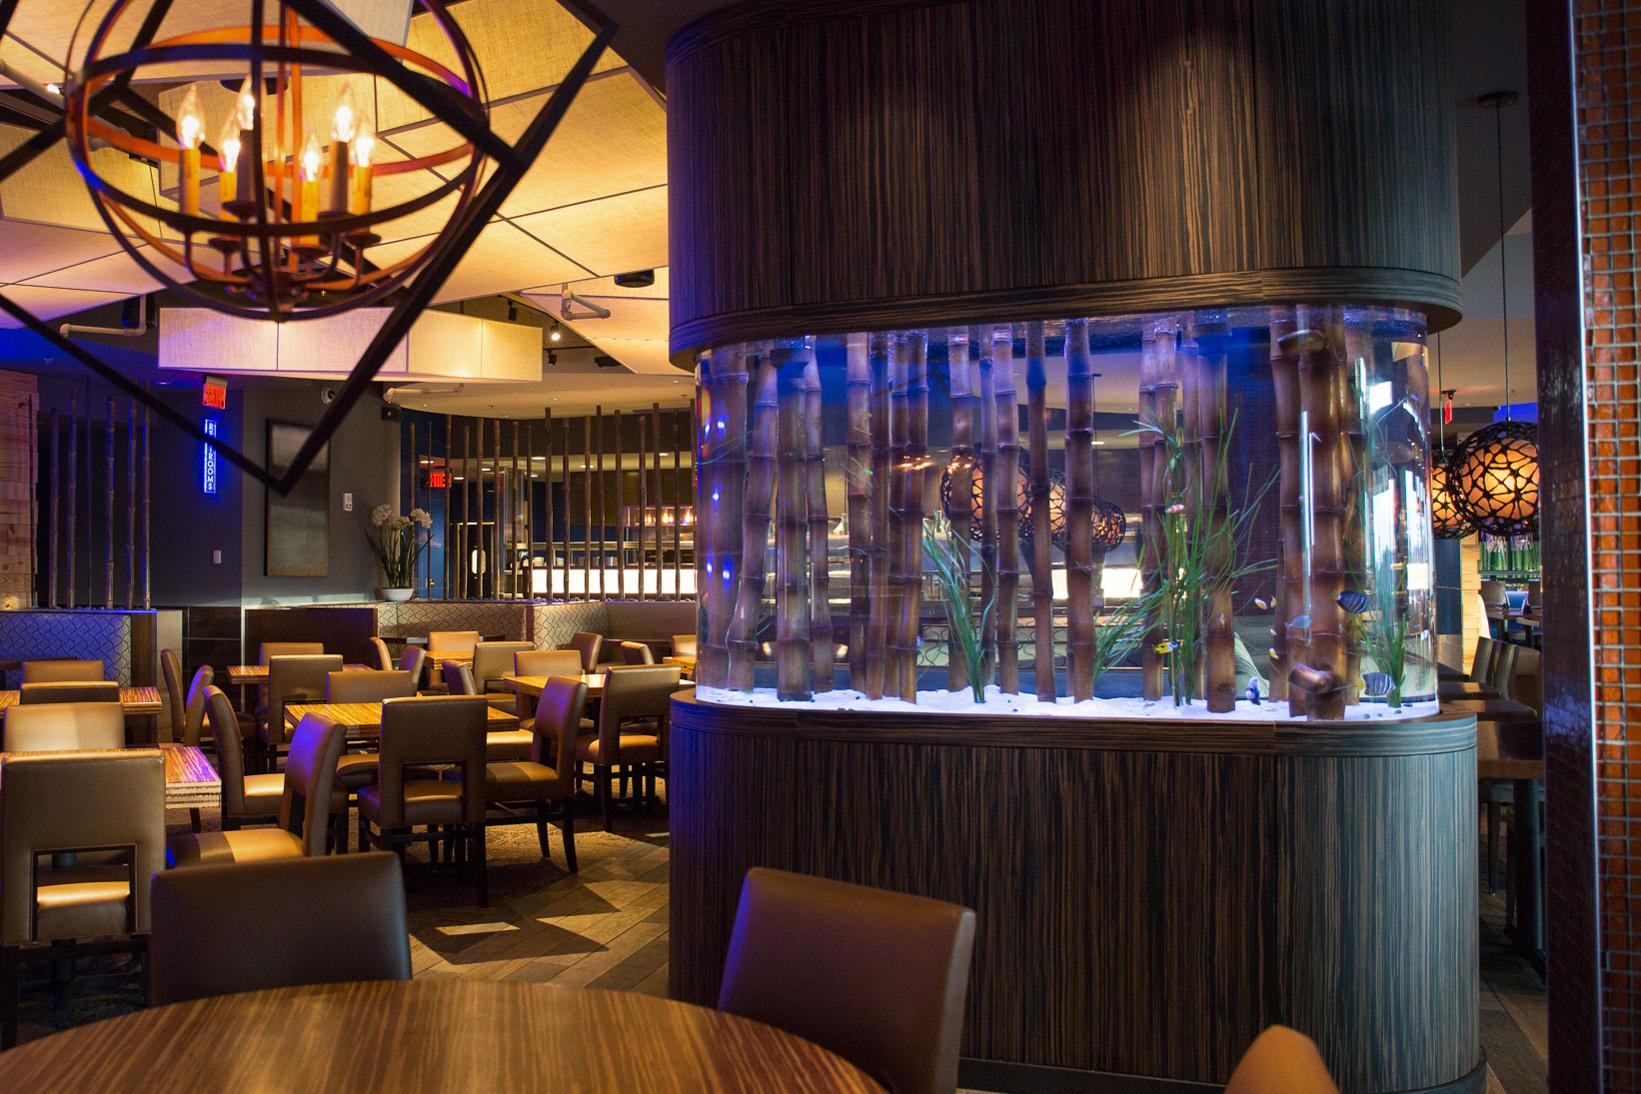 Kona_Grill_Miami_Restaurant_inside_1